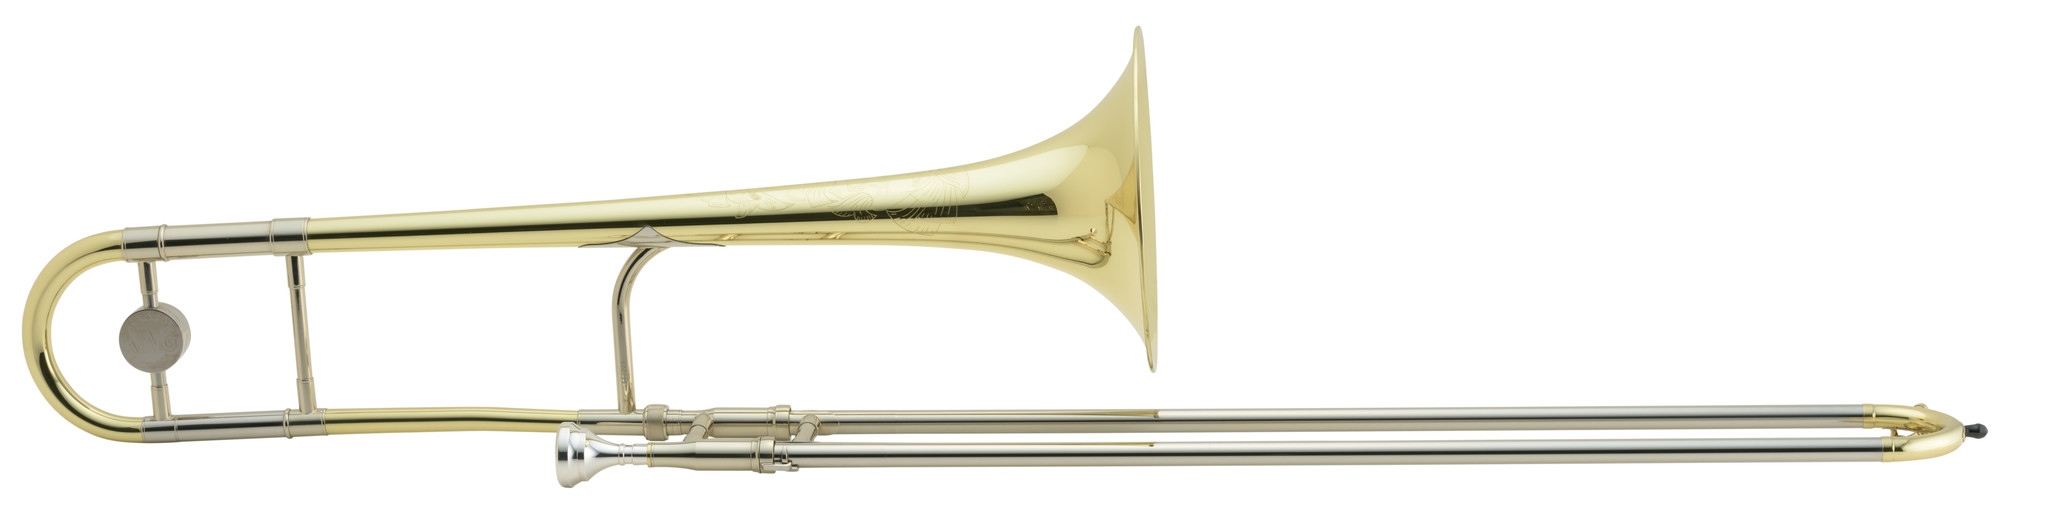 King King 3B Tenor Trombone